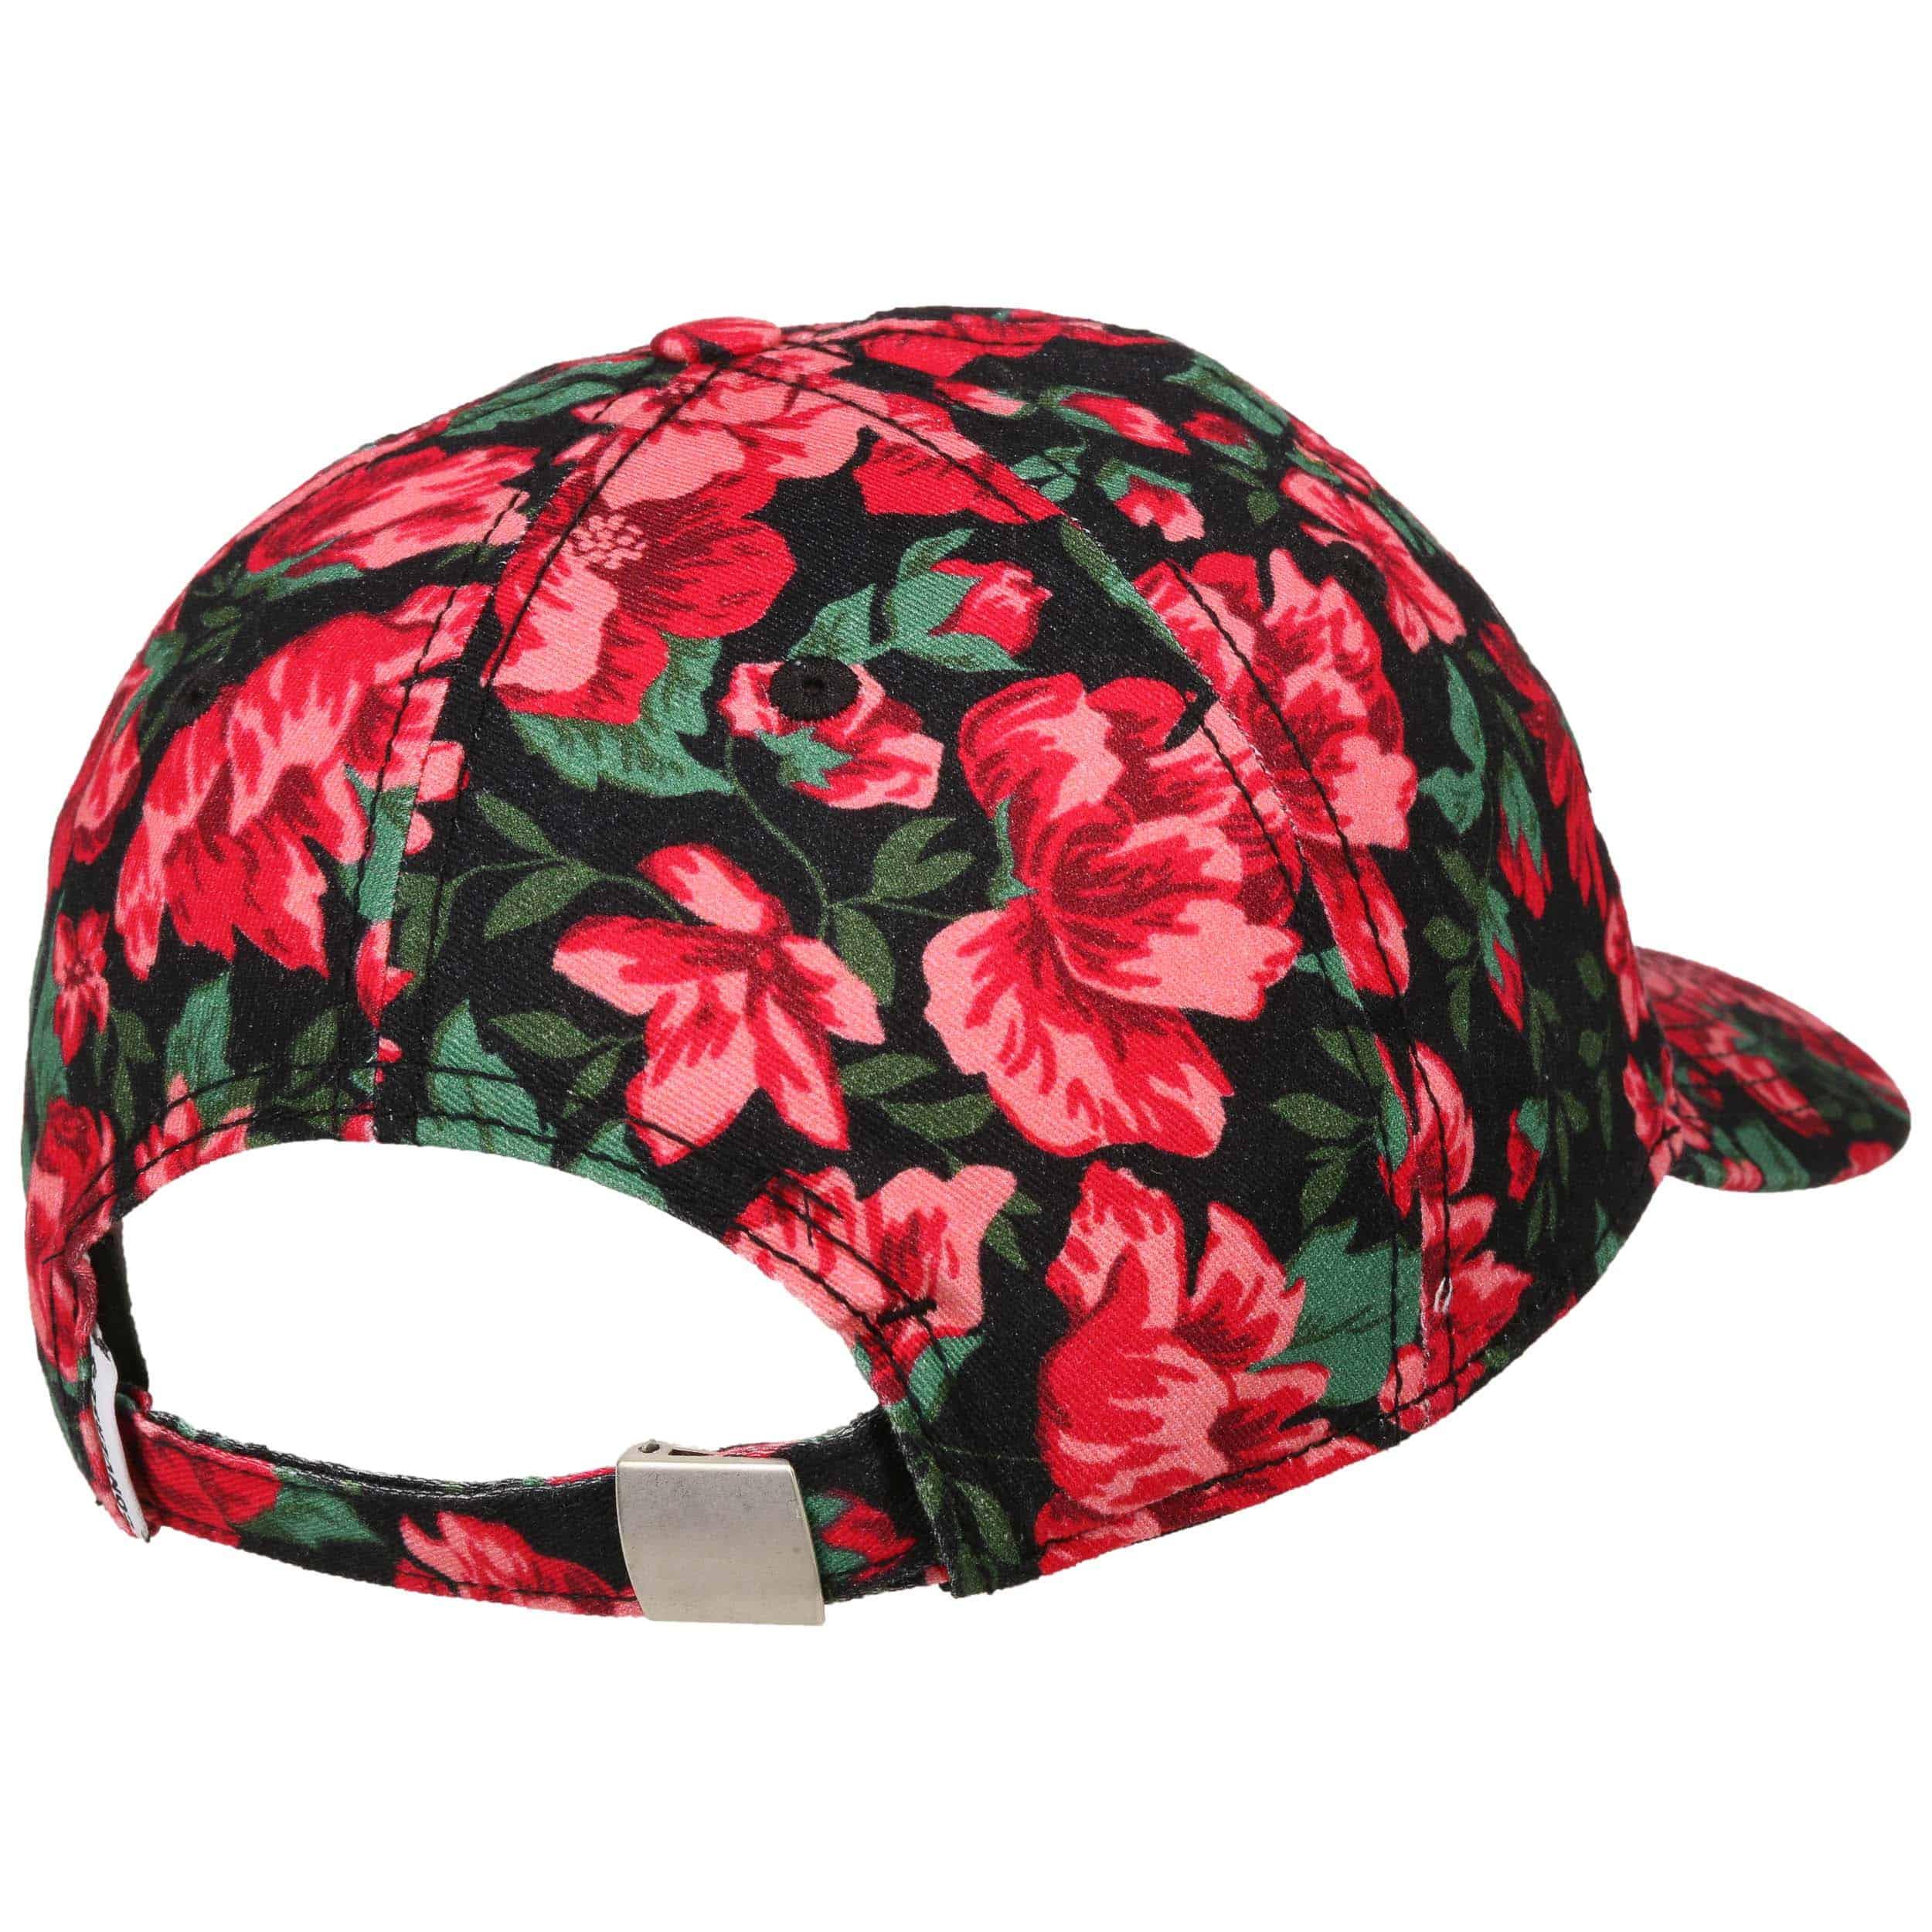 122de500 ... Parkway Floral Cap by Converse - red 3 ...